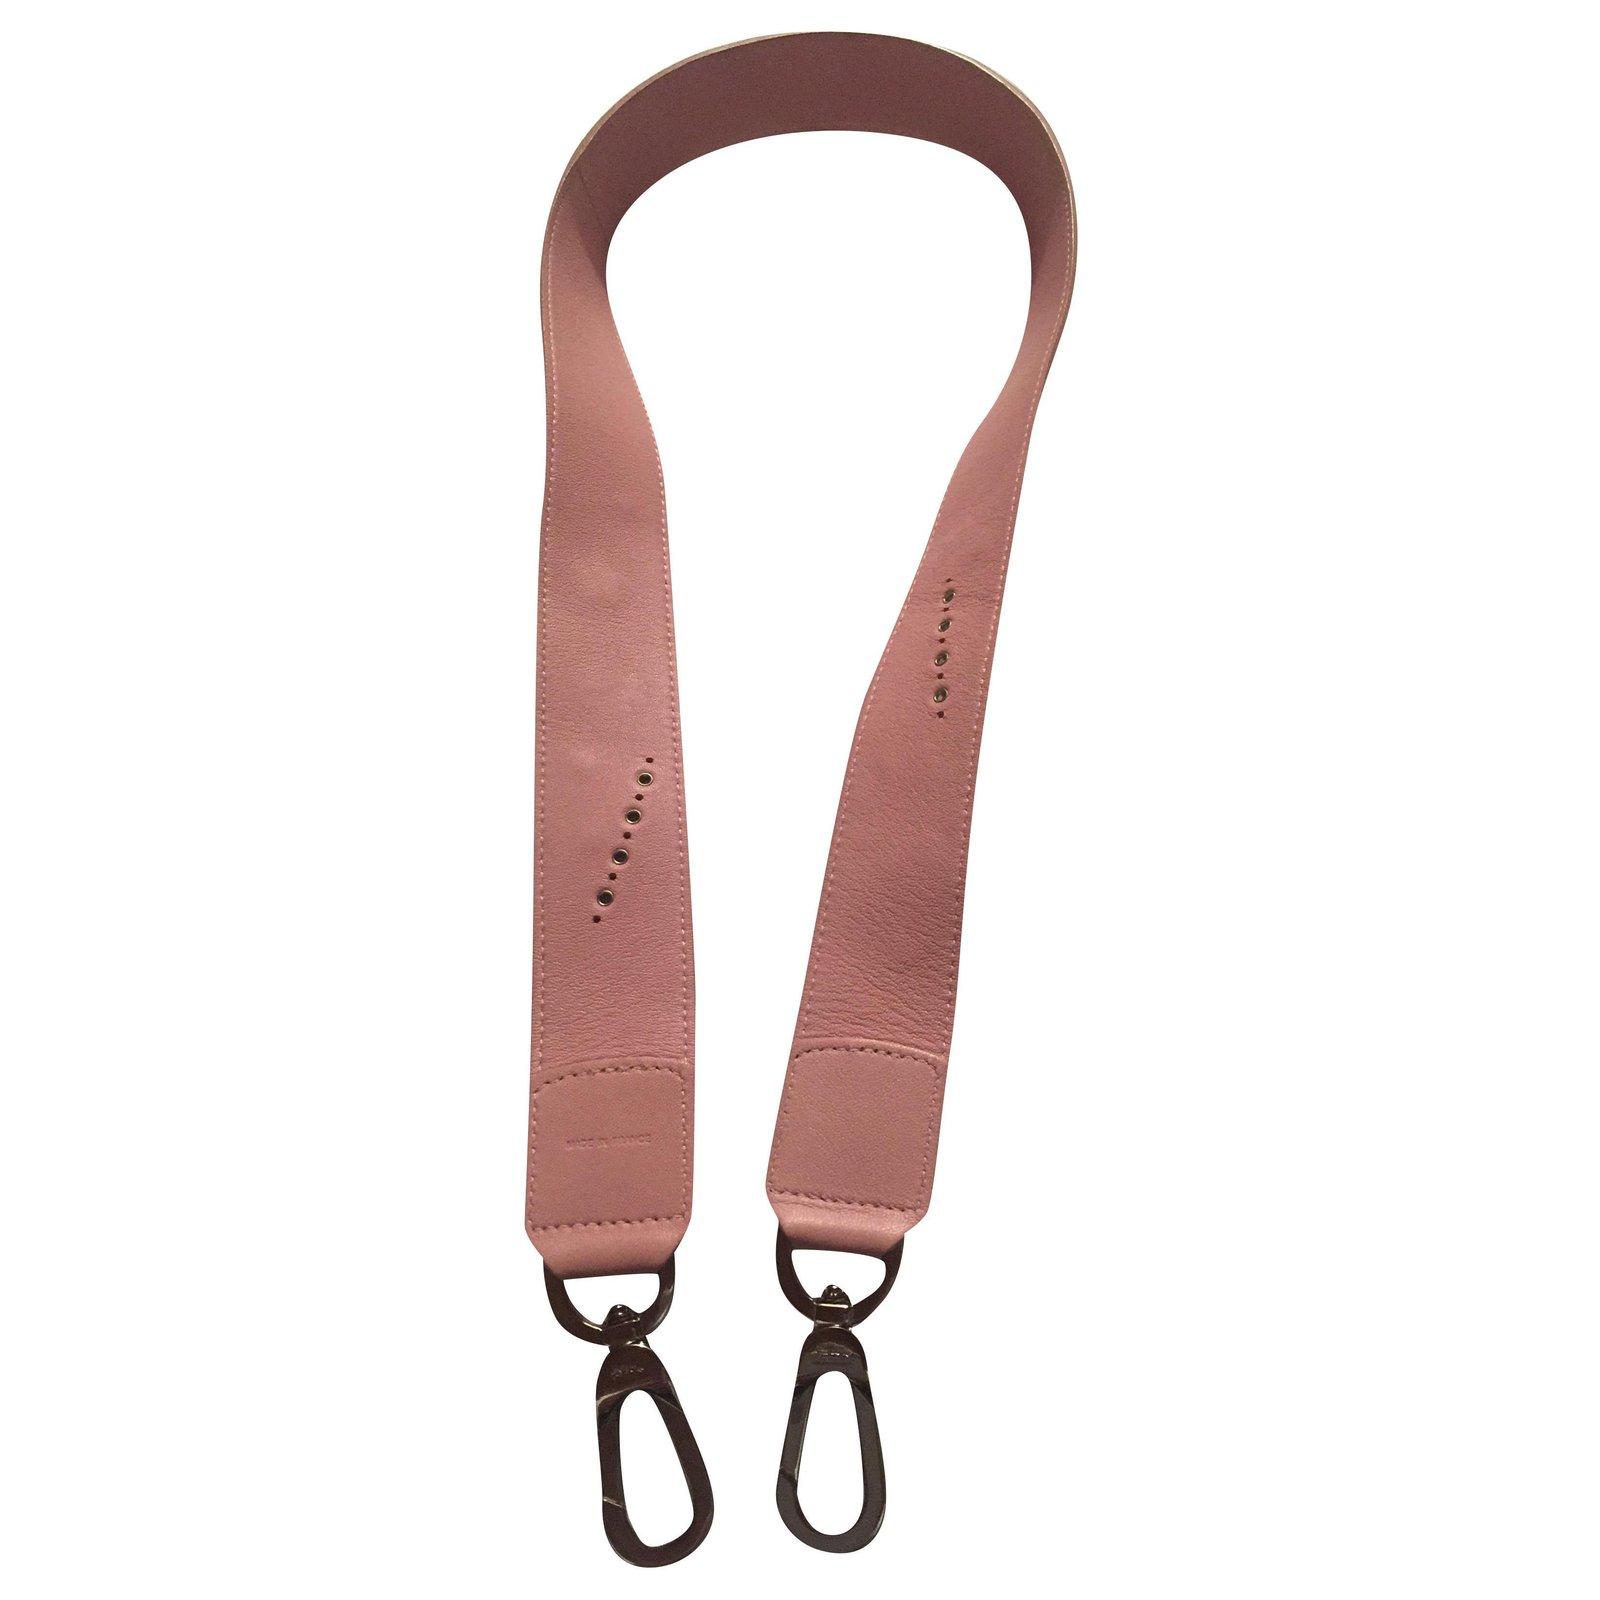 Le pliage cuir decorated shoulder strap